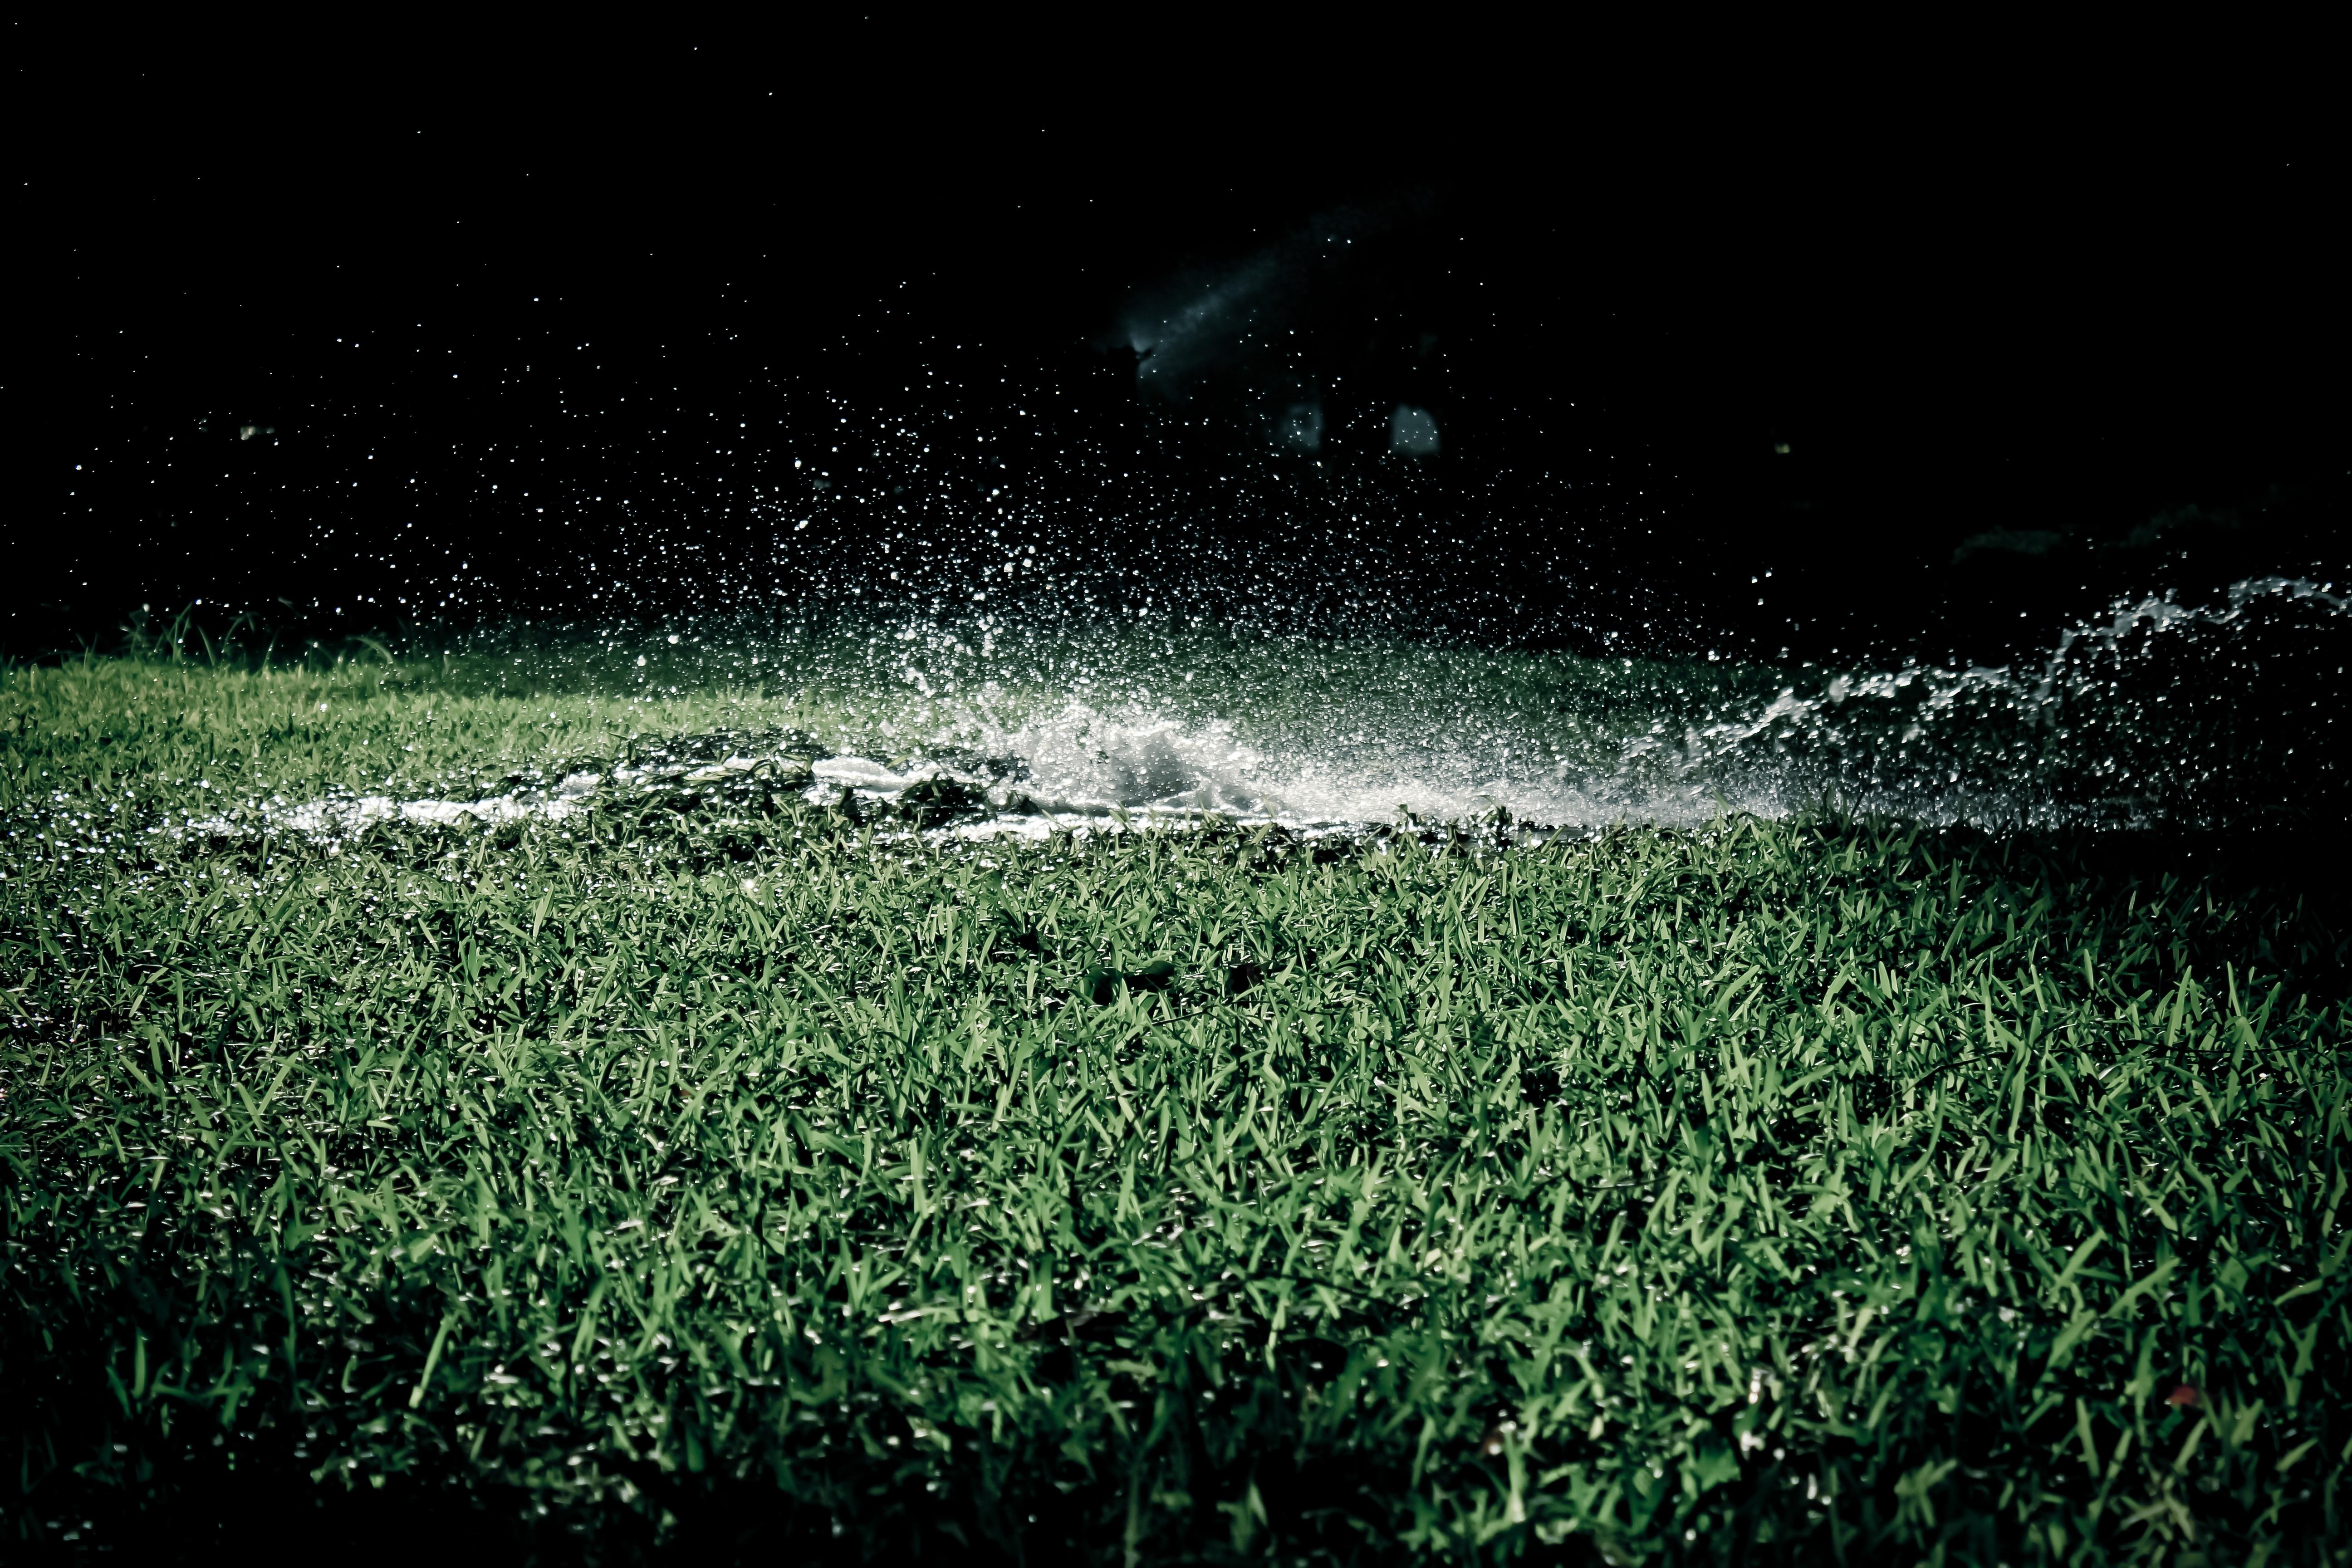 Beautiful Wallpaper Night Grass - landscape-water-nature-grass-outdoor-light-plant-night-lawn-sunlight-water-drop-leaf-flower-wet-spring-green-spray-backyard-darkness-garden-gardening-drops-sprinkler-yard-watering-macro-photography-atmosphere-of-earth-computer-wallpaper-625352  Pictures-979967.jpg